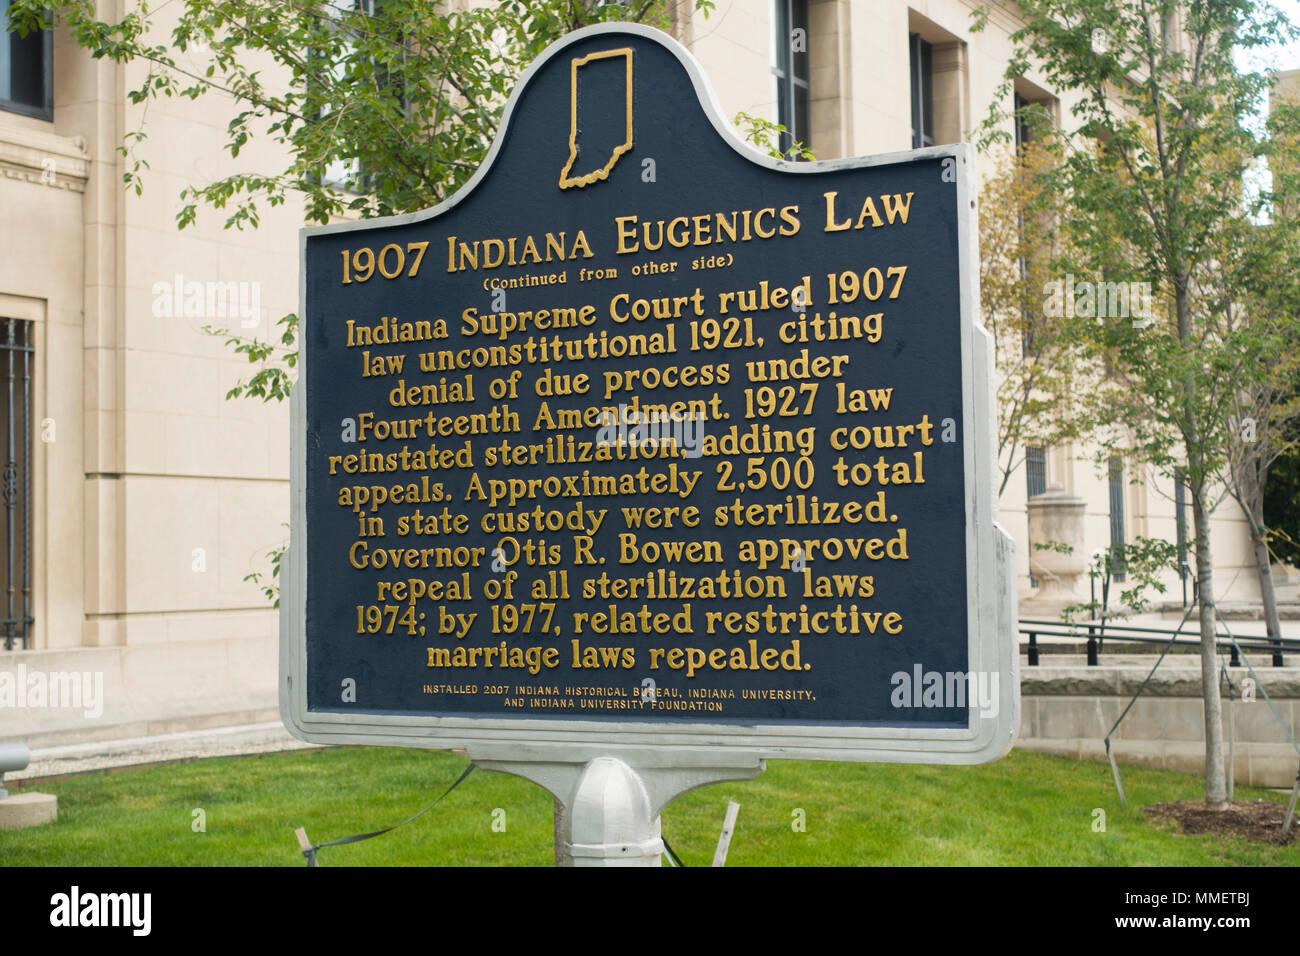 1907 Indiana Eugenics law plaque Indianapolis - Stock Image